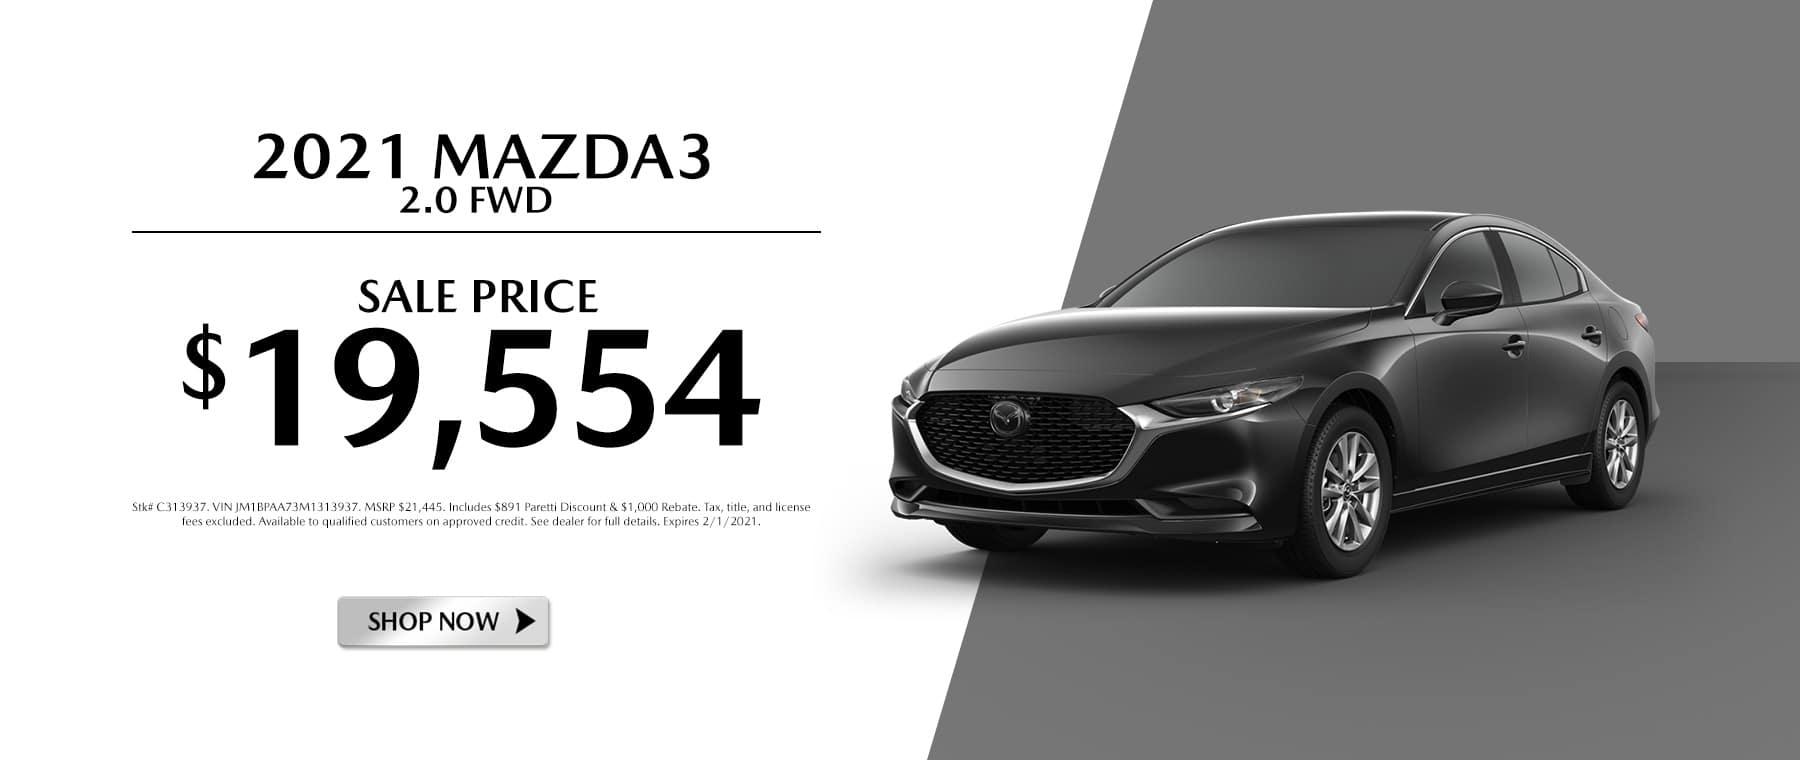 ParettiMazda_1800x760_1-21_Mazda35